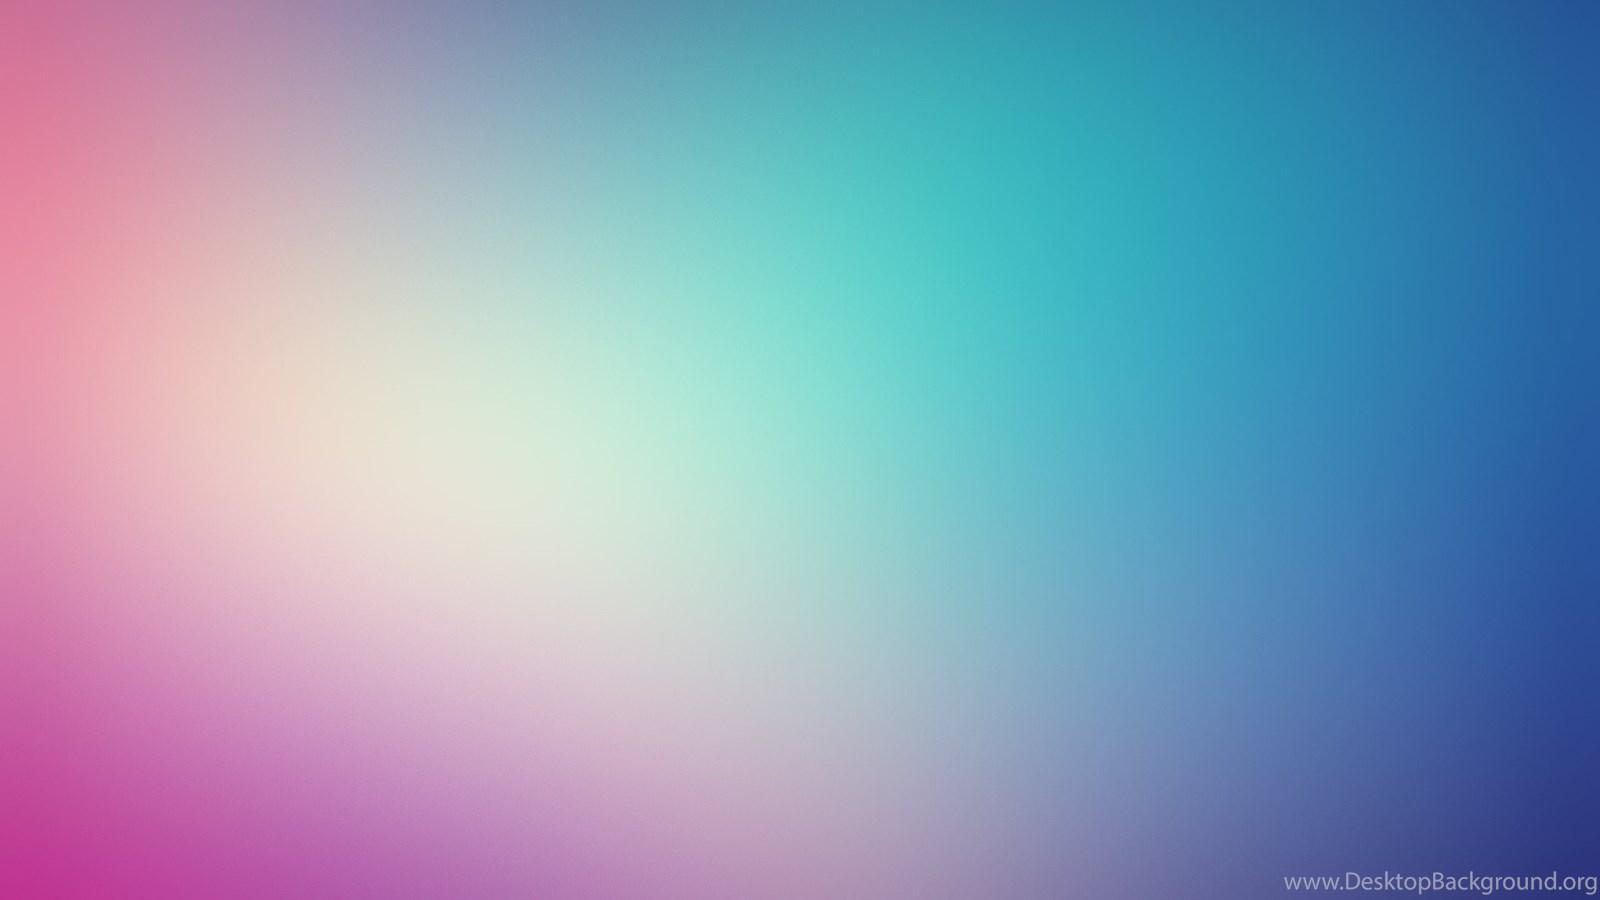 Iphone 4s Original Wallpaper Hd Colorful Gradient Wallpapers Desktop Background